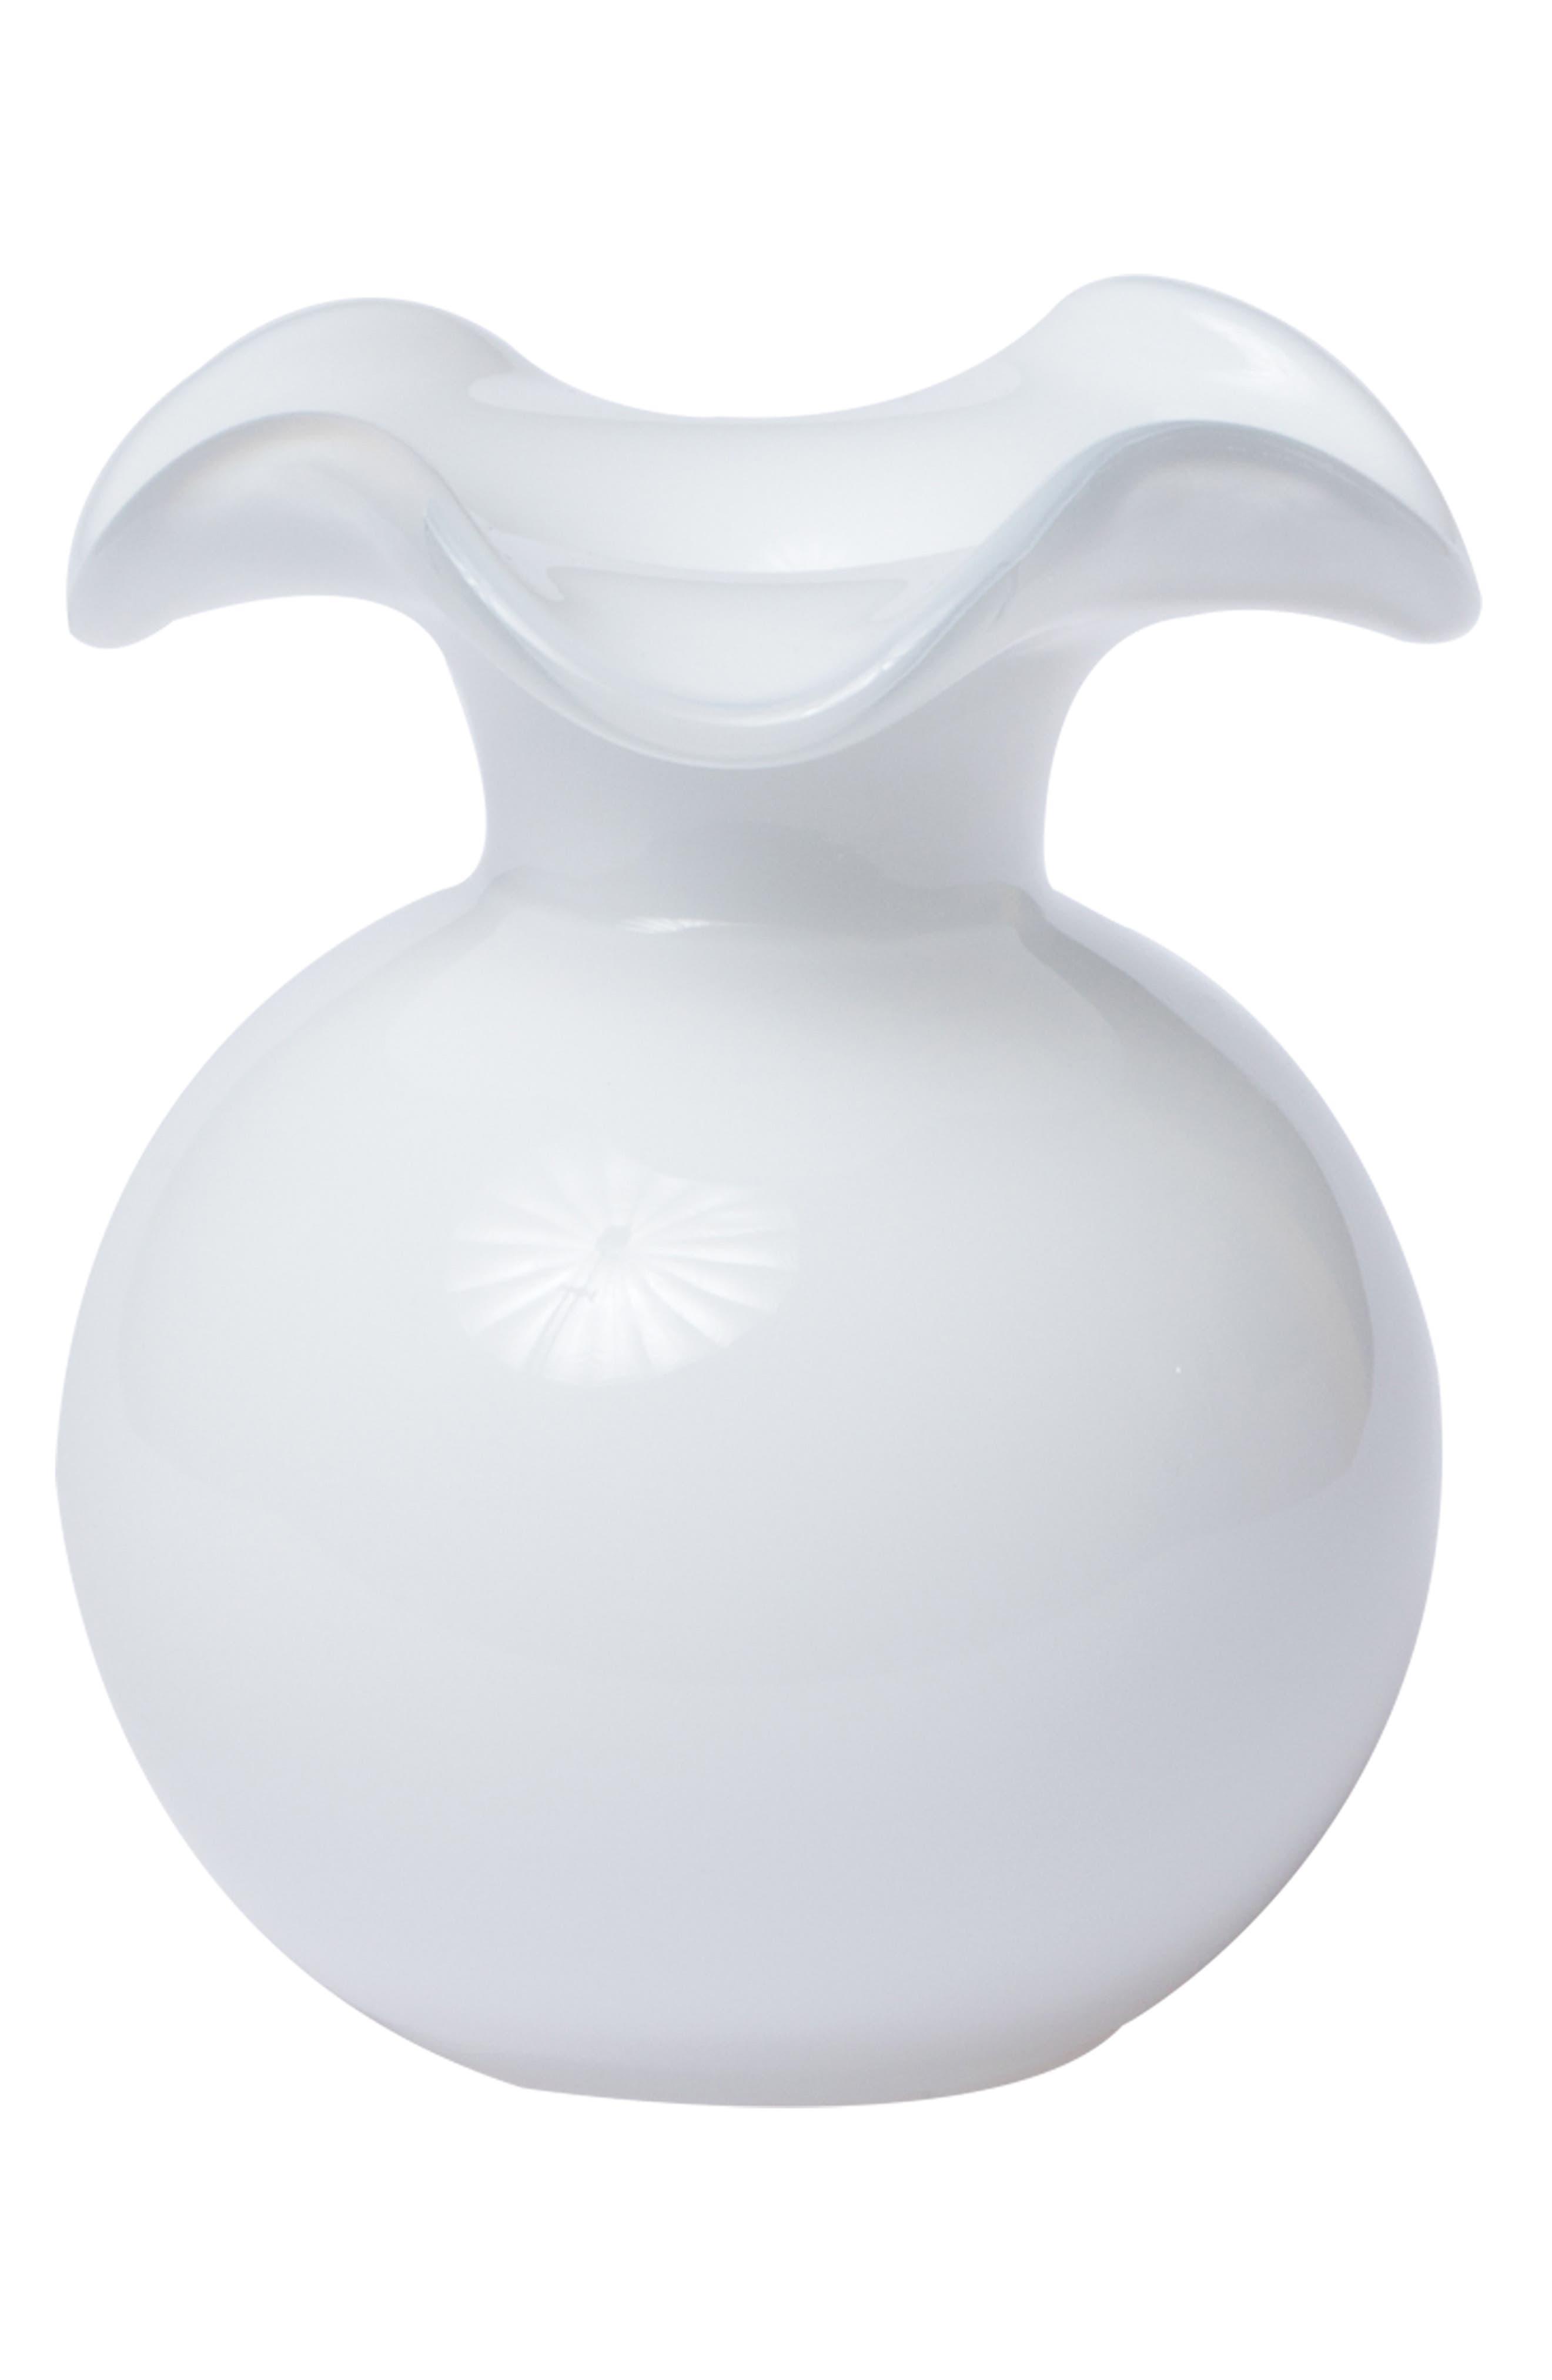 Hibiscus Bud Vase,                             Main thumbnail 1, color,                             WHITE